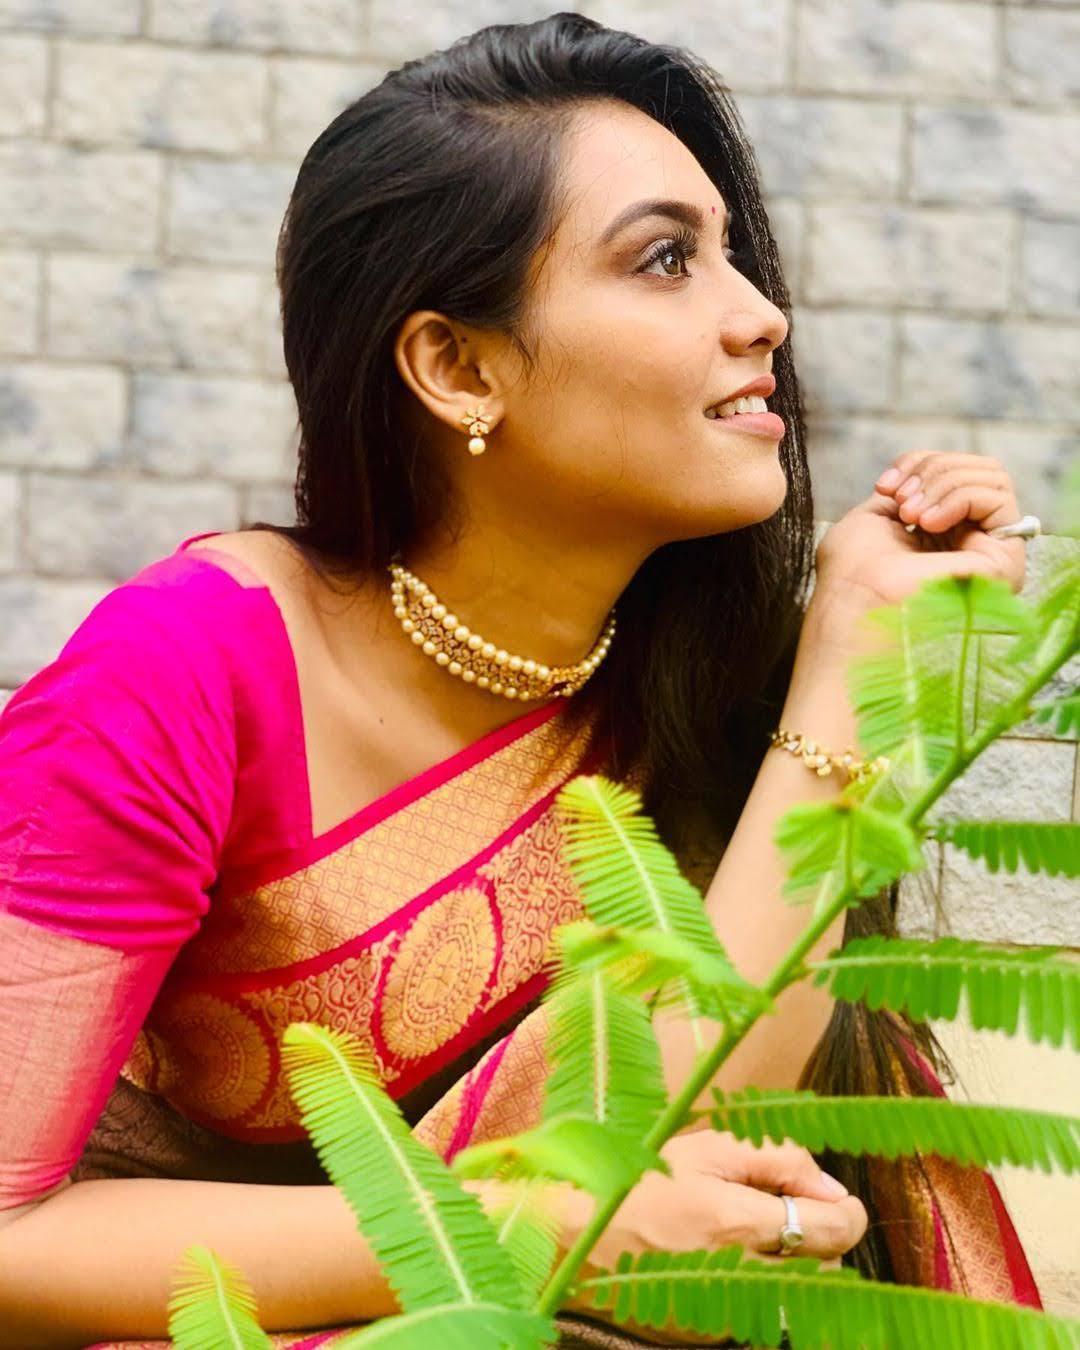 pavithra-janani-64694